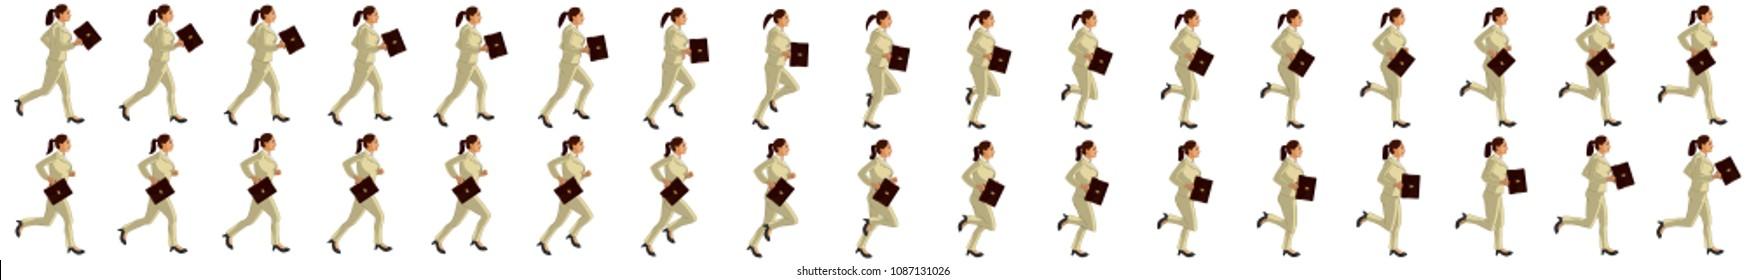 Business girl running animation sprite sheet